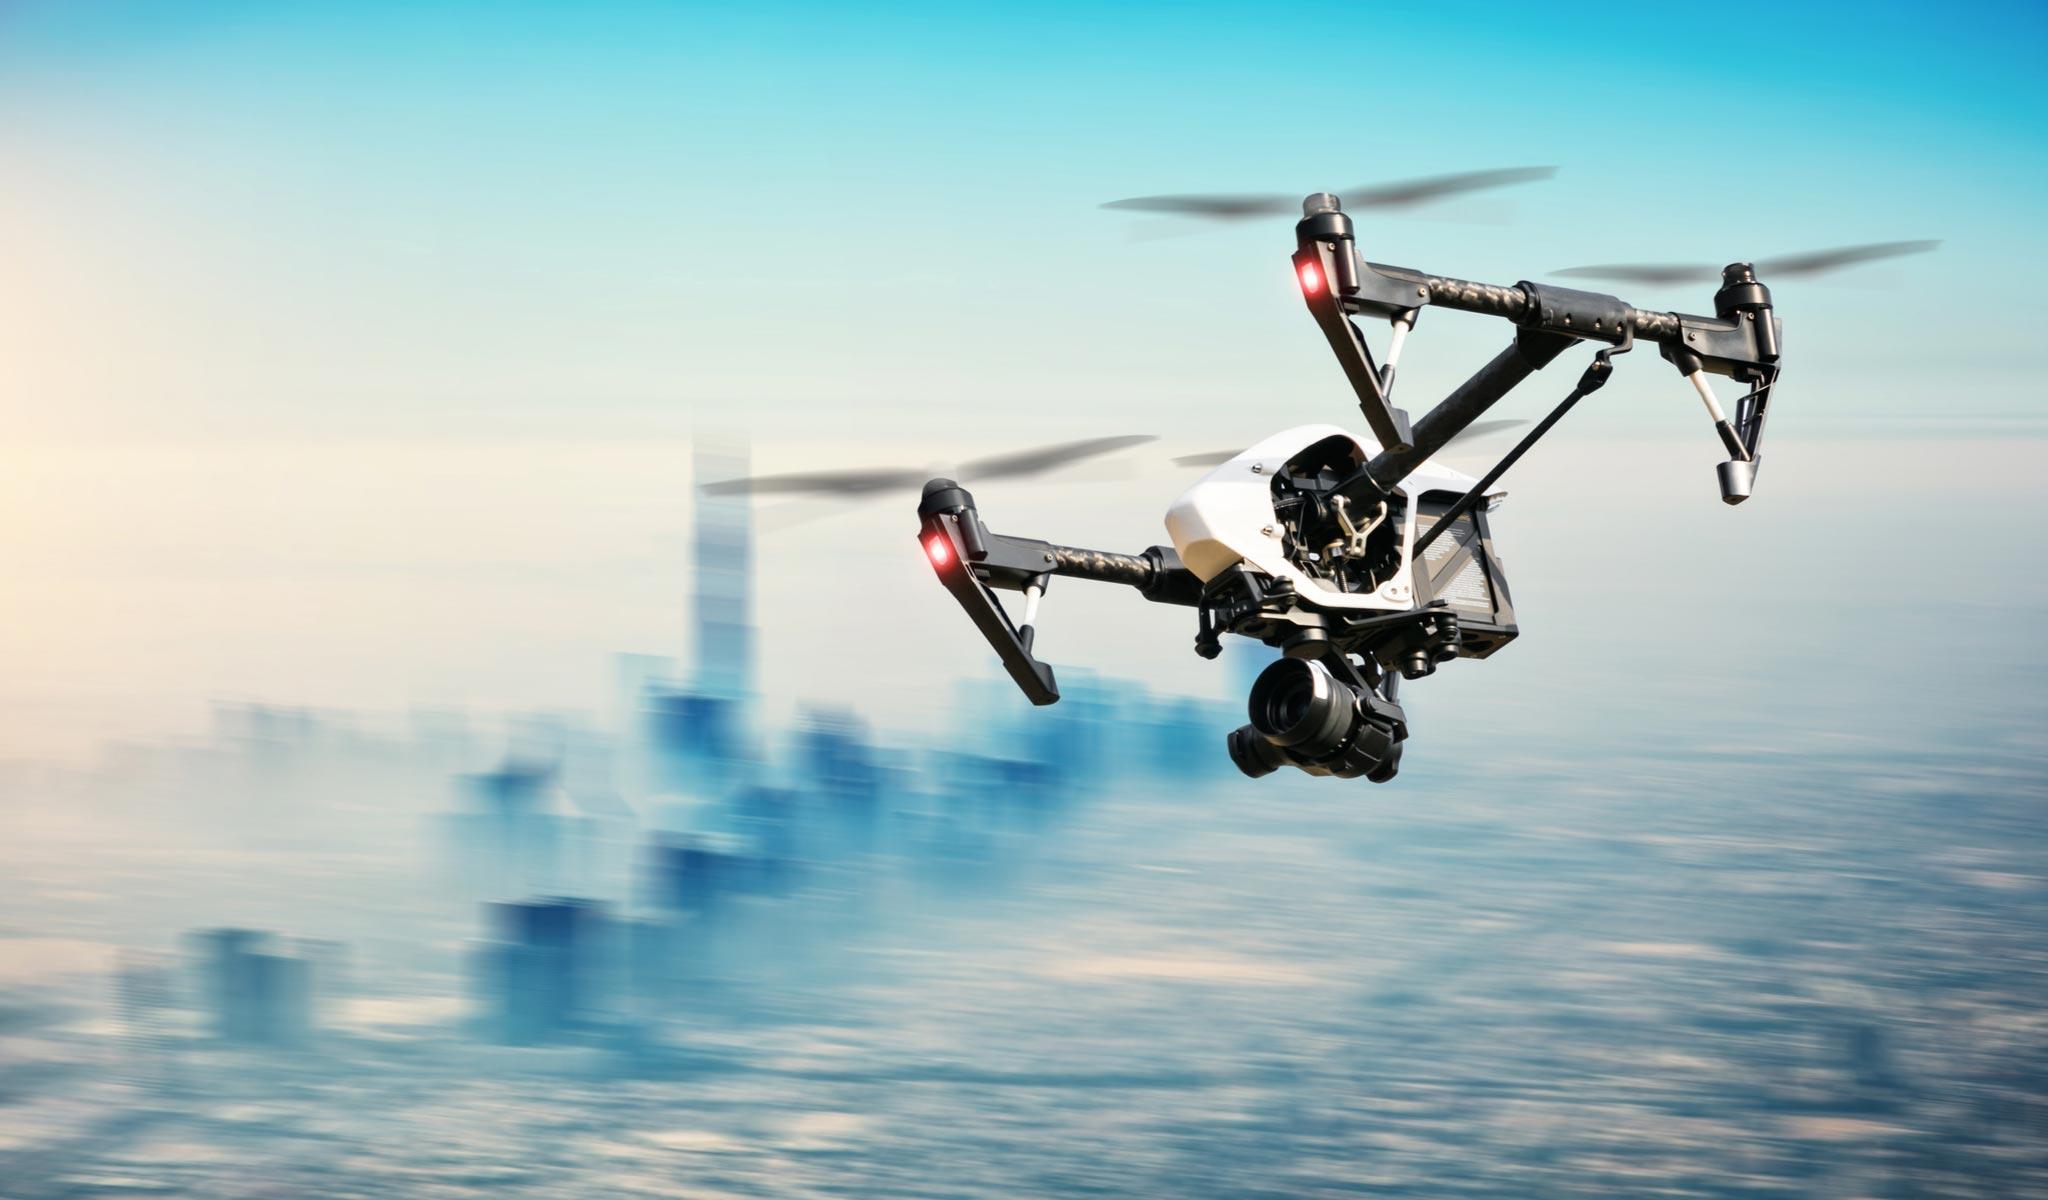 Drone Use Outpaces Flight Rules | Atty. Michael P. Schmiege